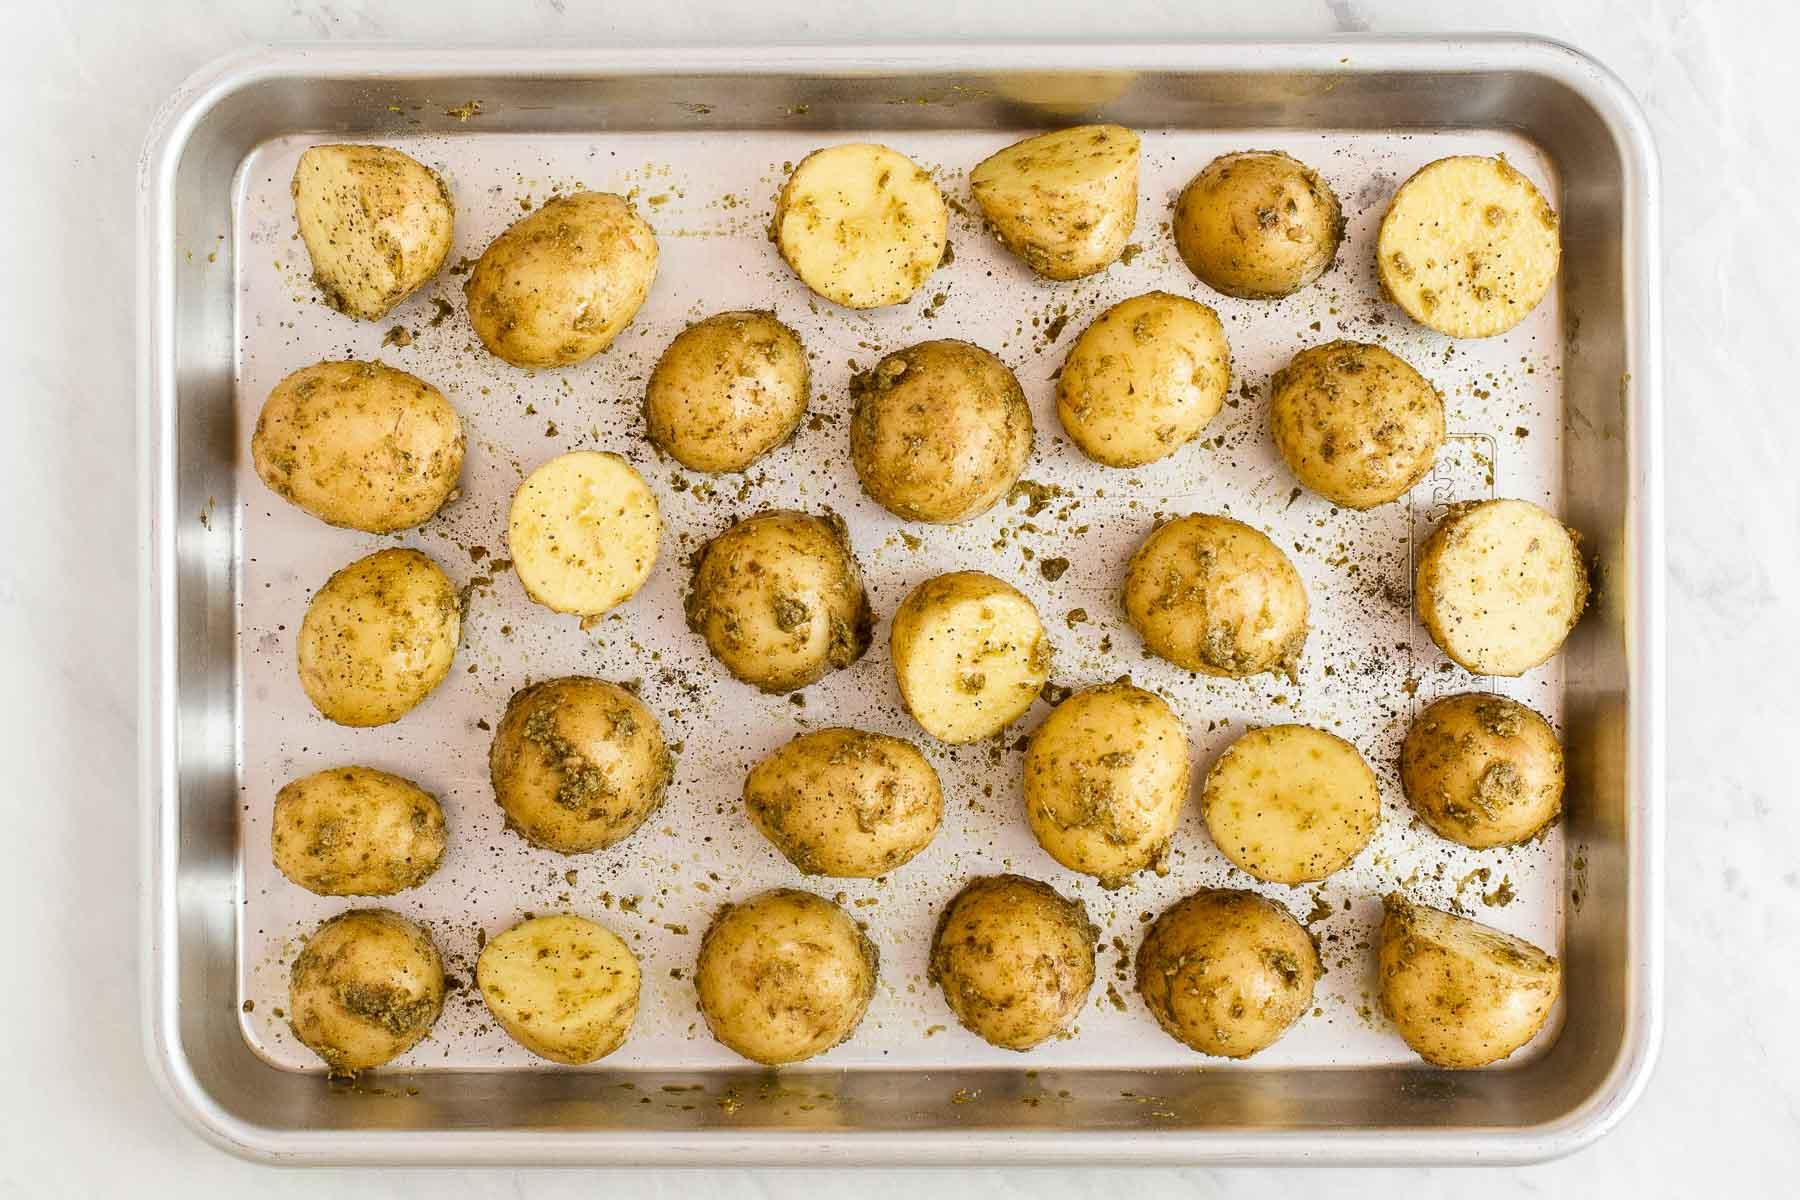 Raw potatoes on sheet pan with pesto coating.